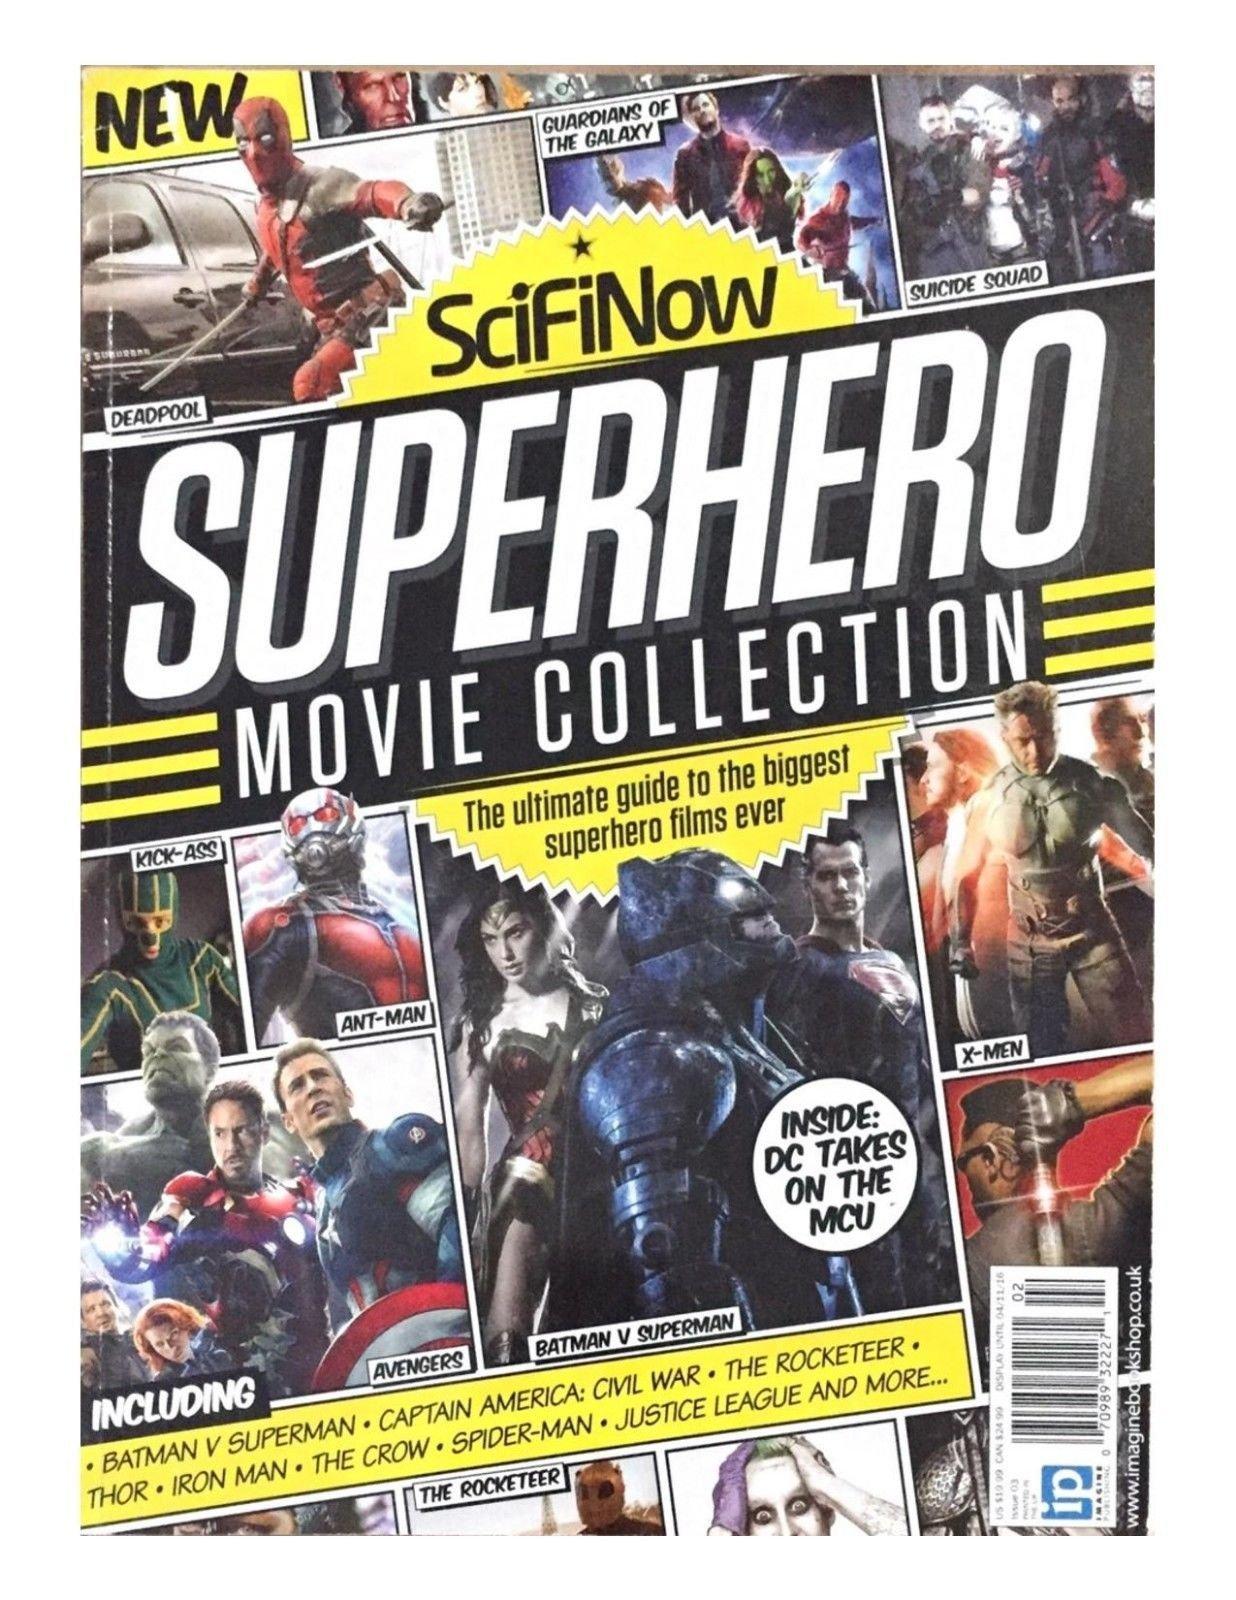 SCIFI NOW MAGAZINE, THE SUPERHERO MOVIE COLLECTION, THIRD EDITION